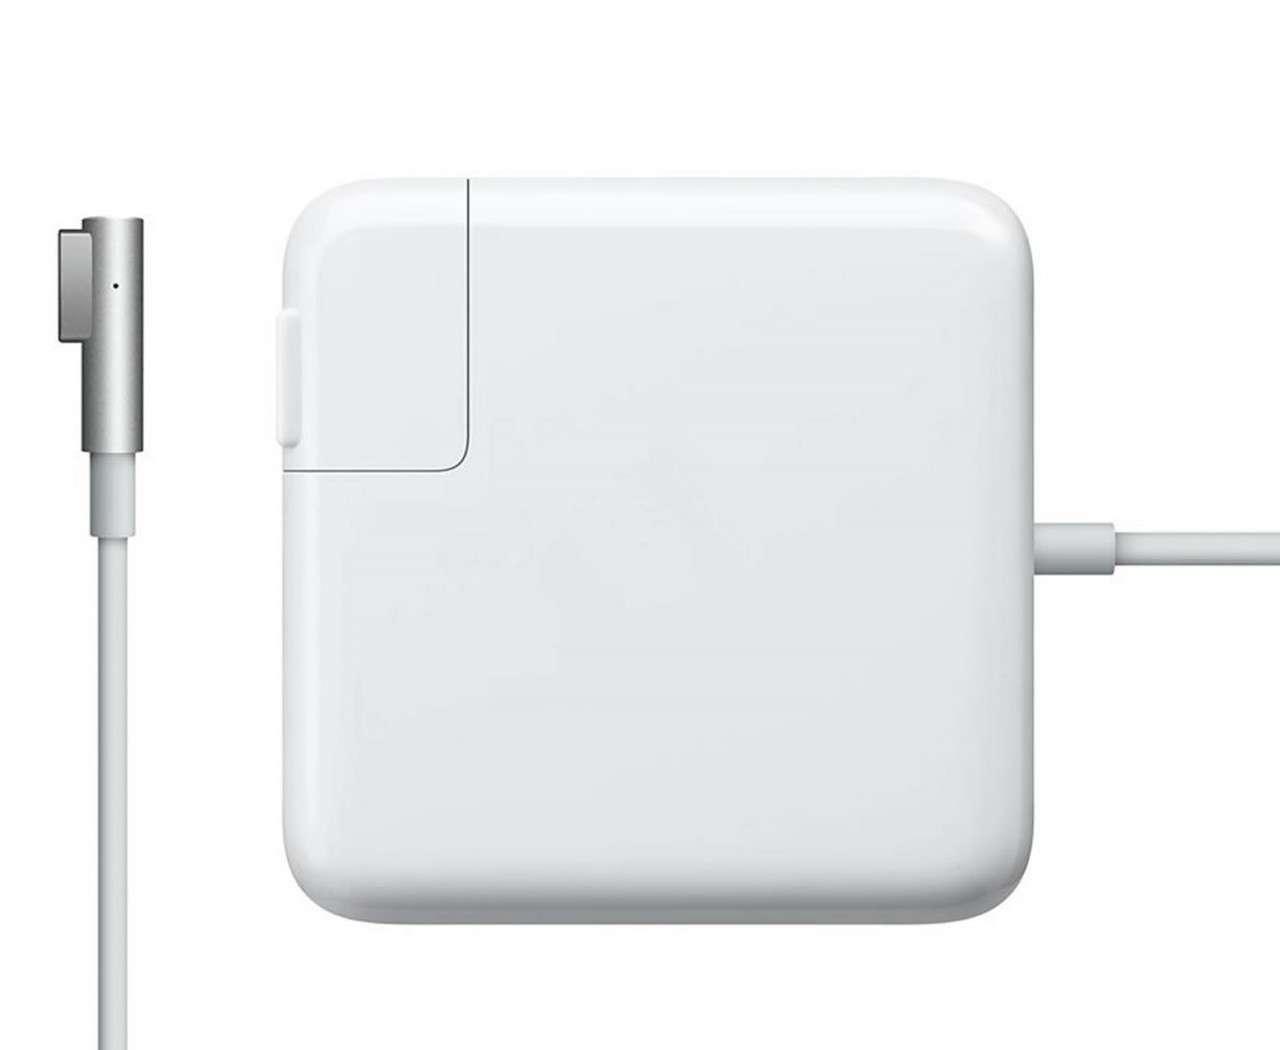 Incarcator Apple MacBook A1330 imagine powerlaptop.ro 2021